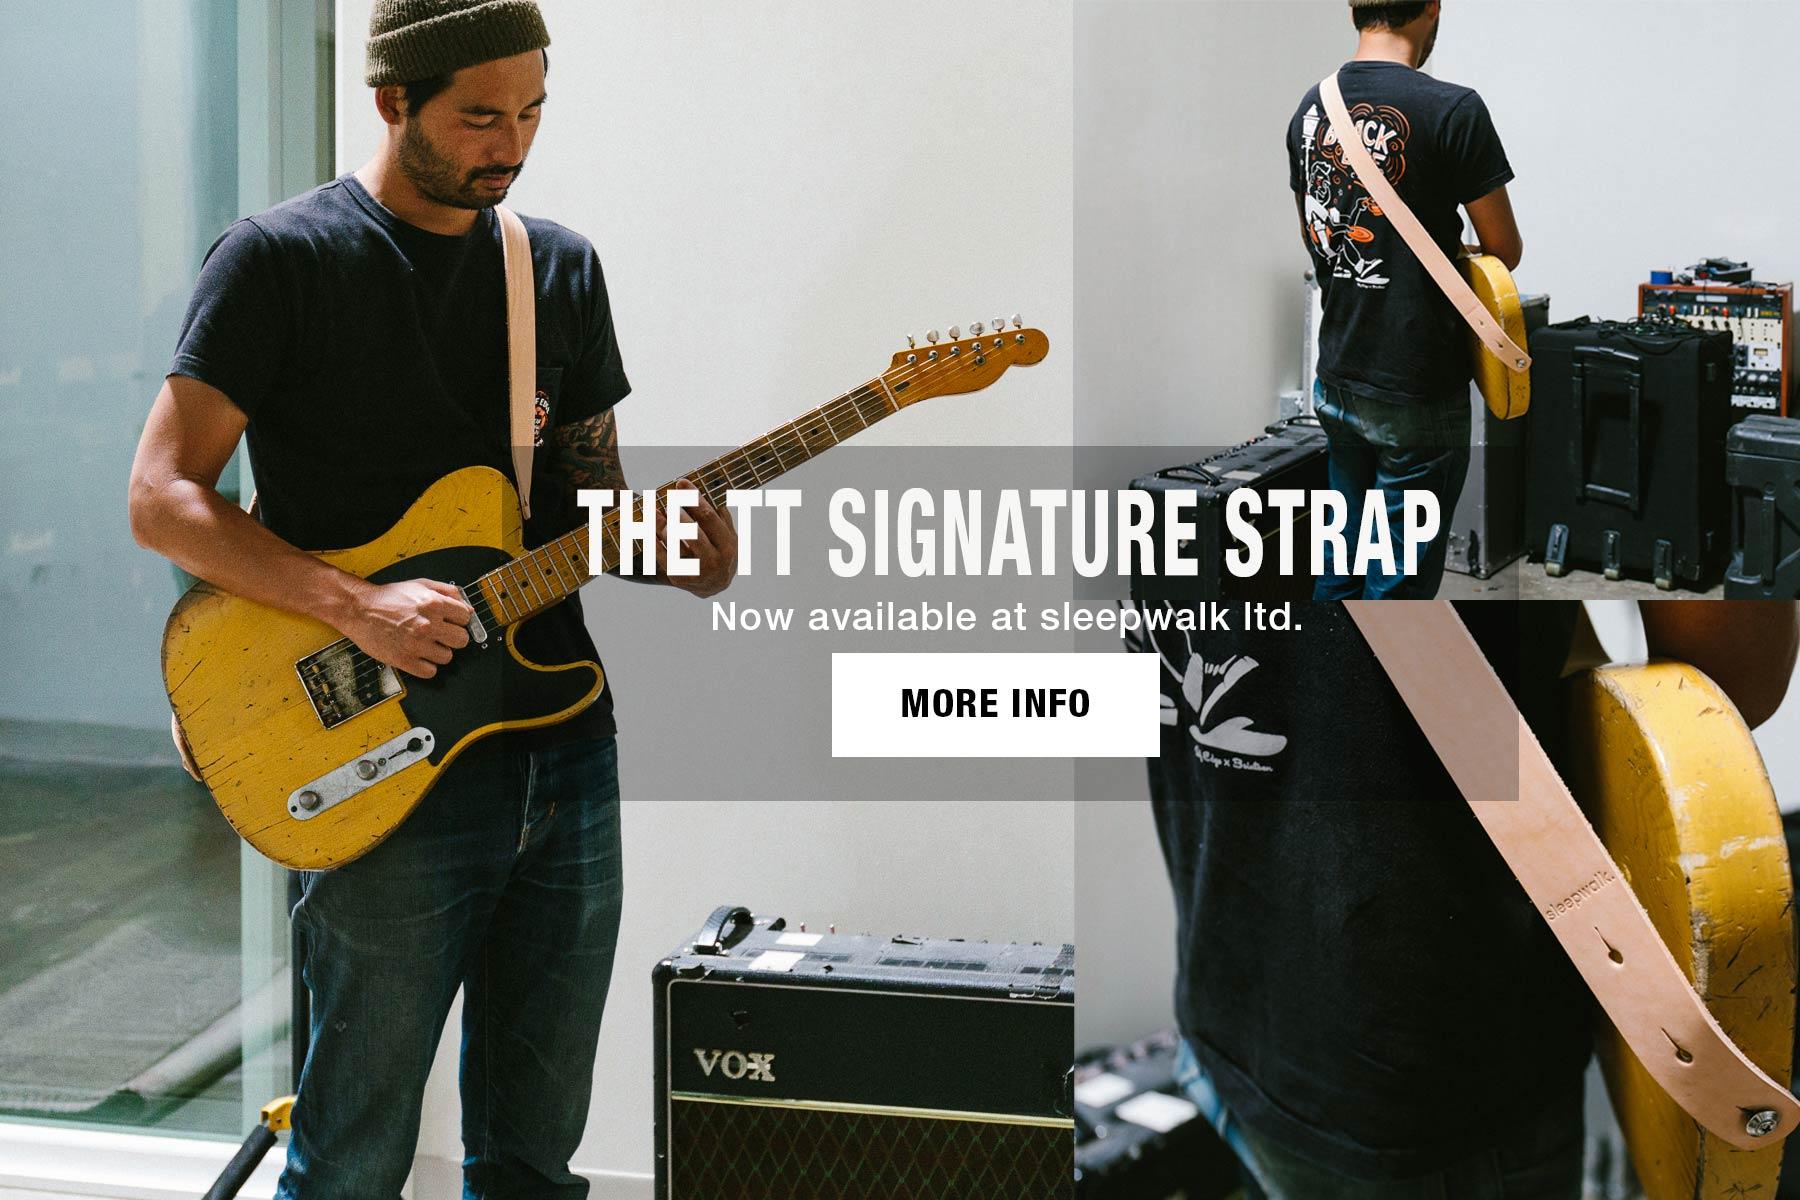 sleepwalk-truman-tt-strap-ss-image.jpg